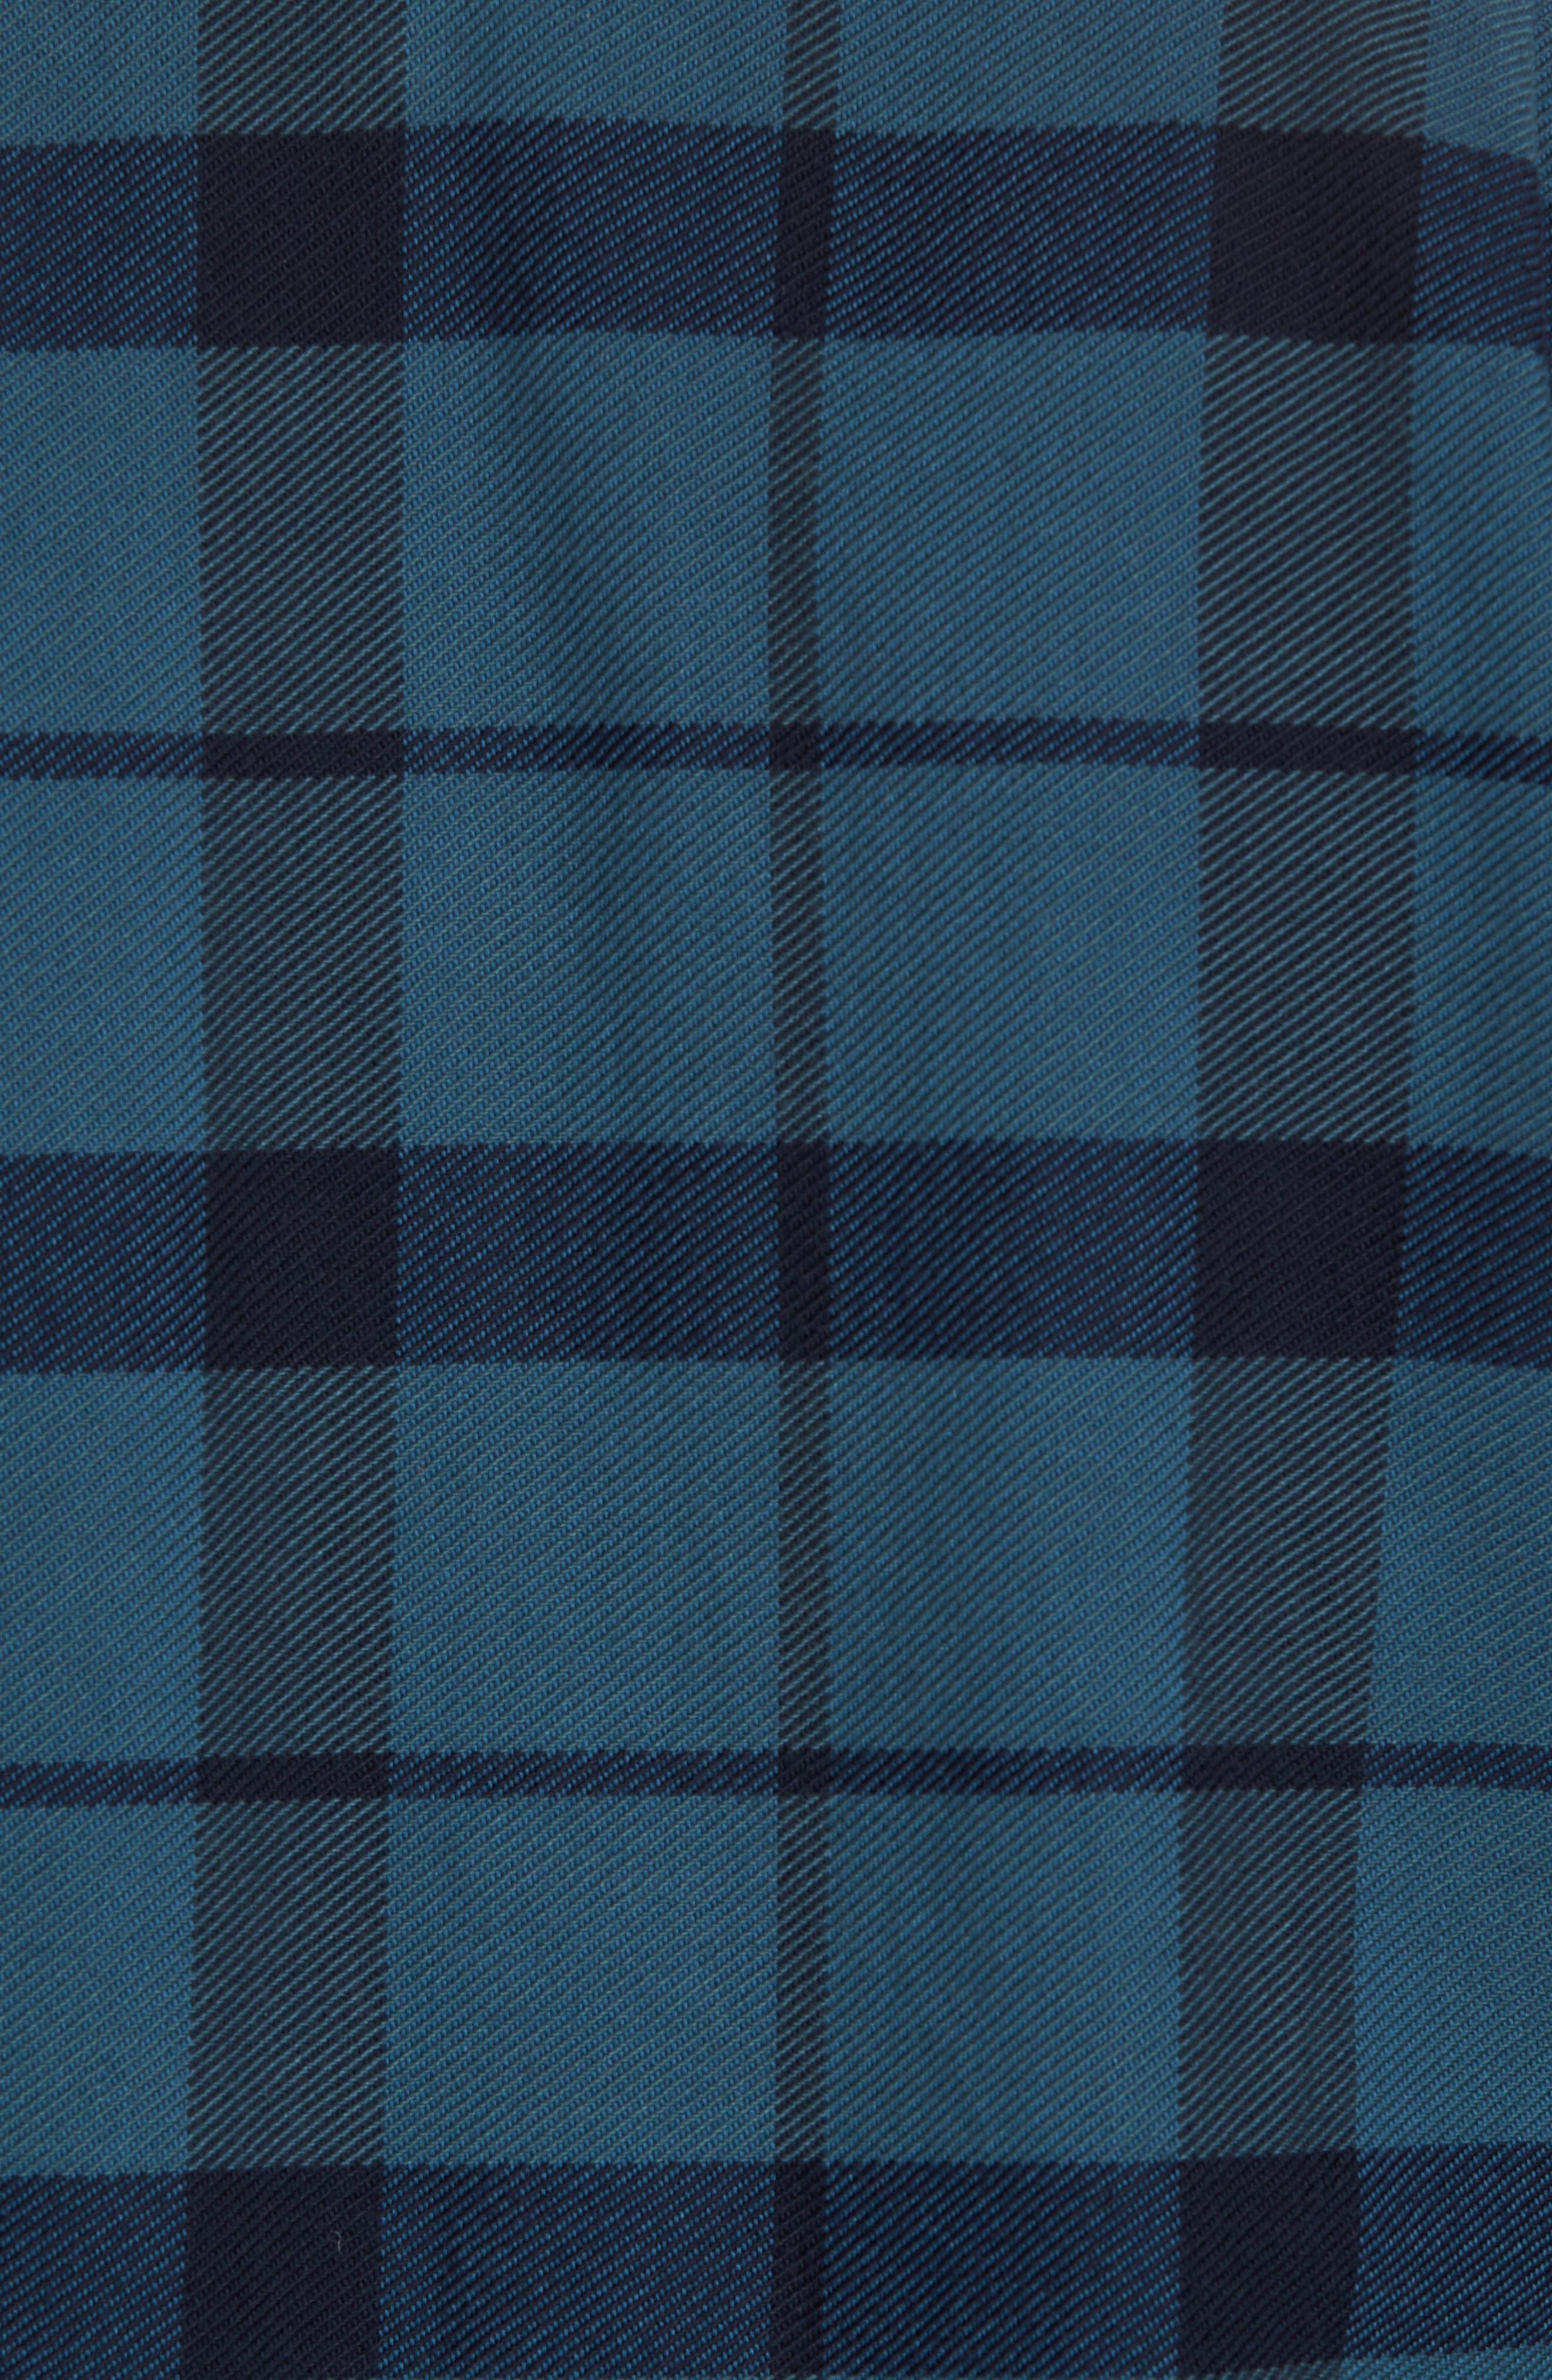 'Vintage Flannel' Regular Fit Plaid Cotton Shirt,                             Alternate thumbnail 10, color,                             Brown/ Navy